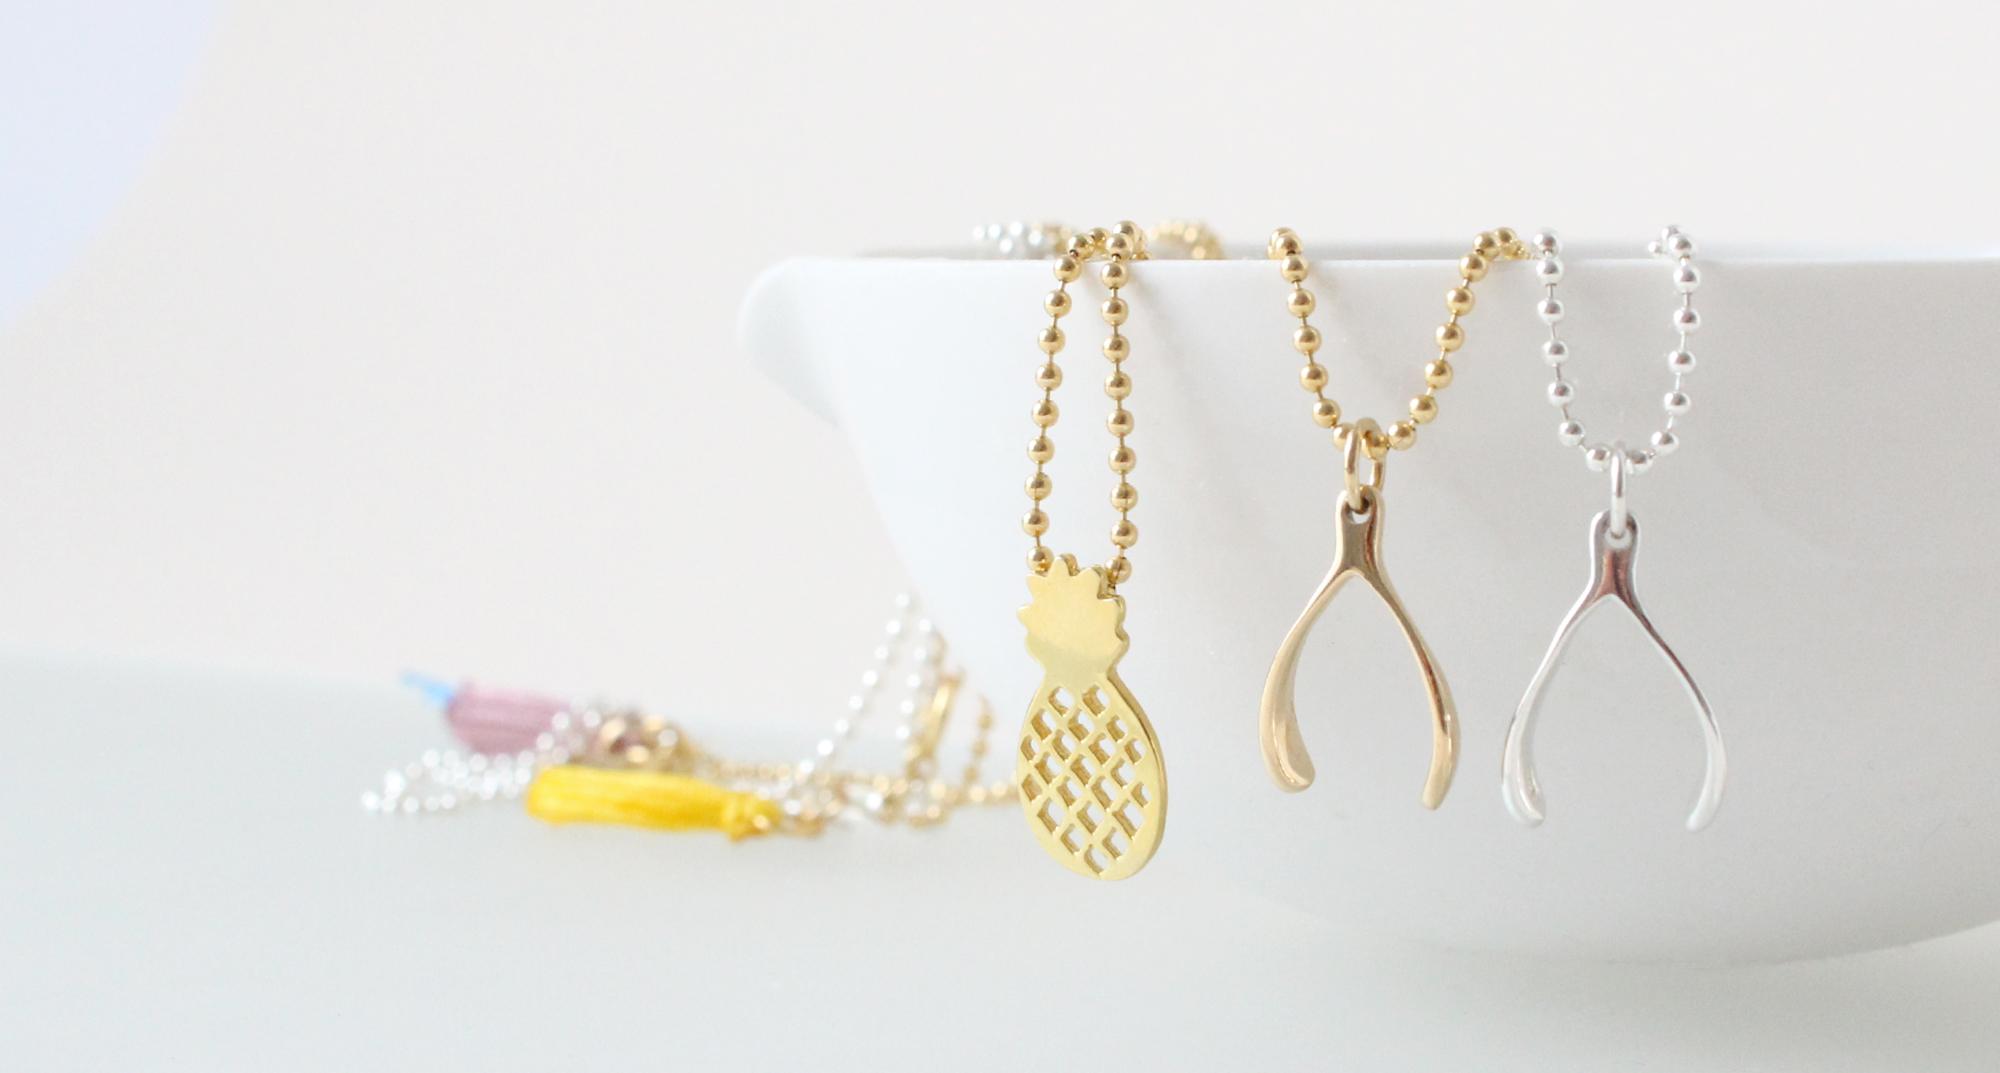 rikkeline-jewellery-necklaces.jpg